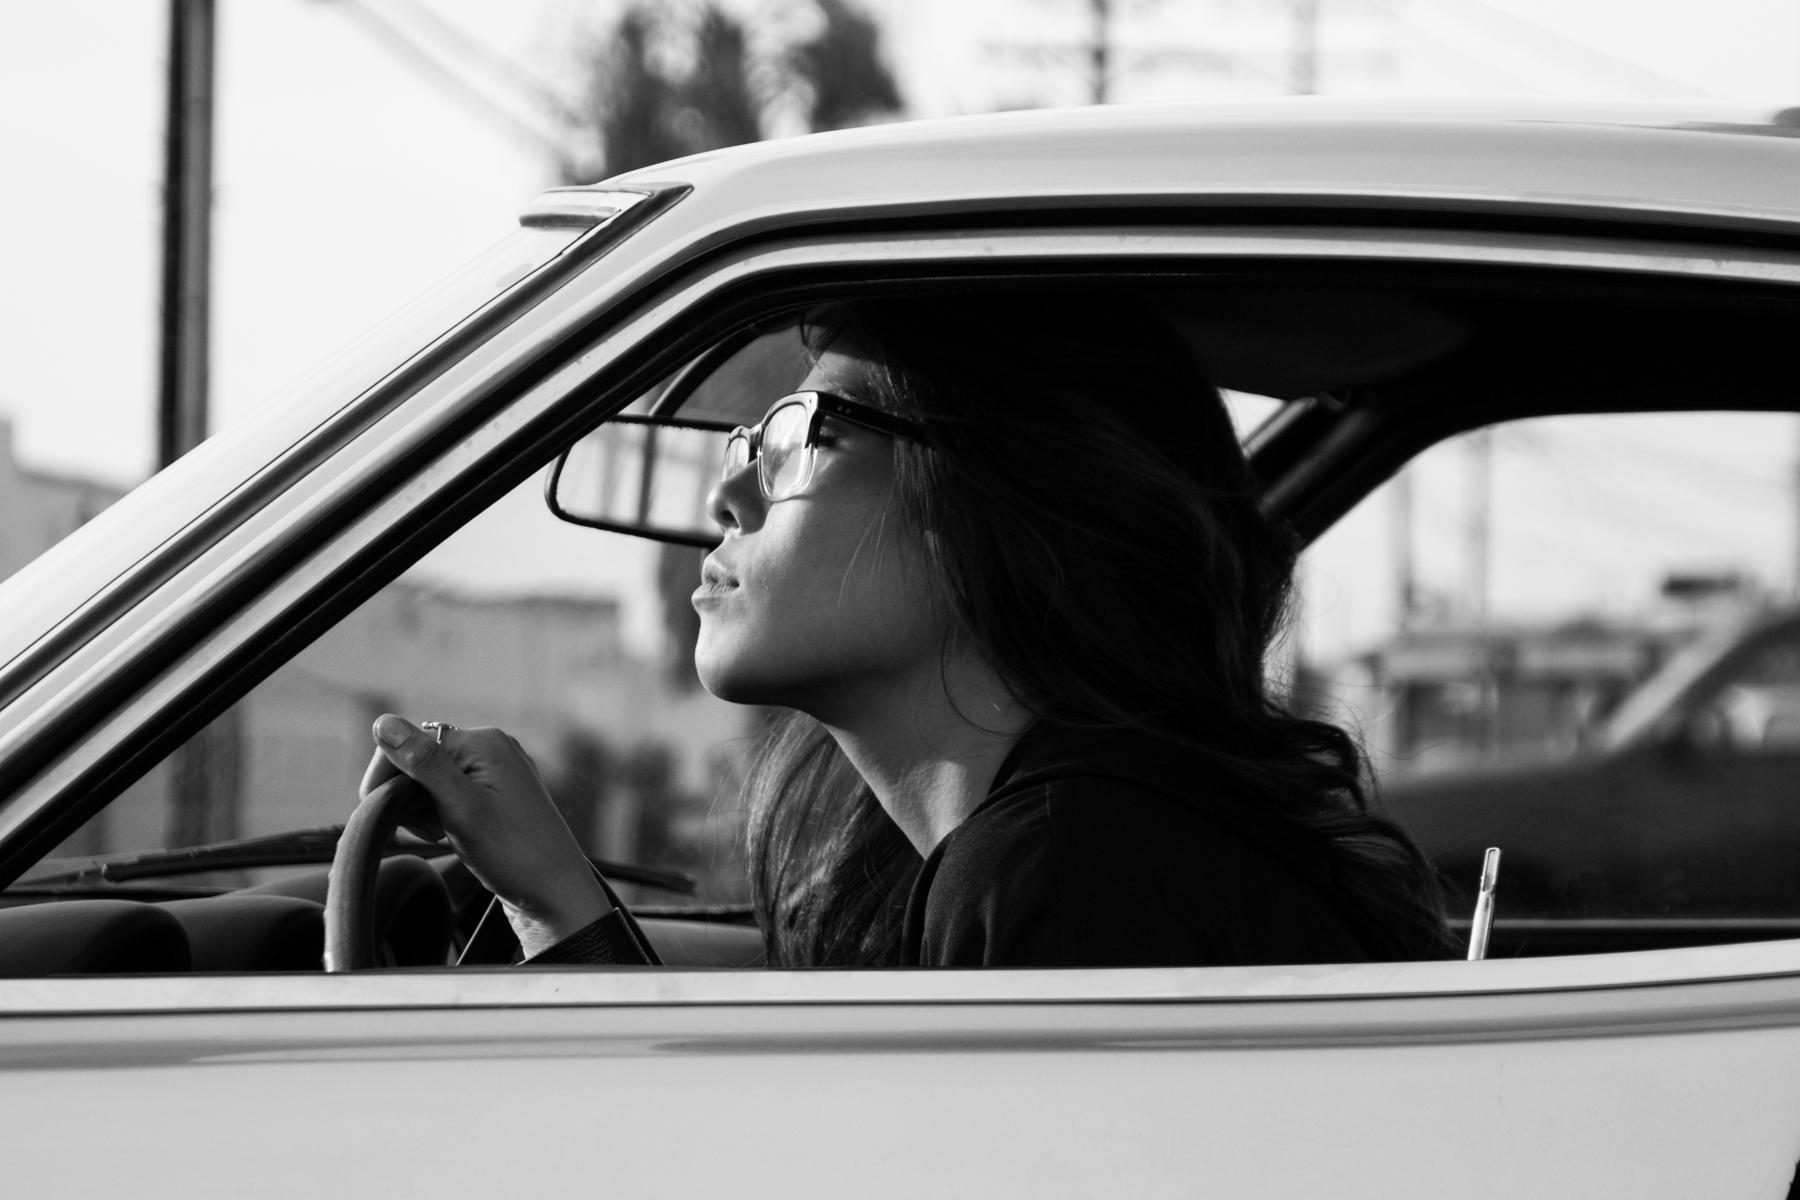 Wasim Muklashy Photography_062614_Samsung NX30_Los Angeles_California_ SAM_5422_1800